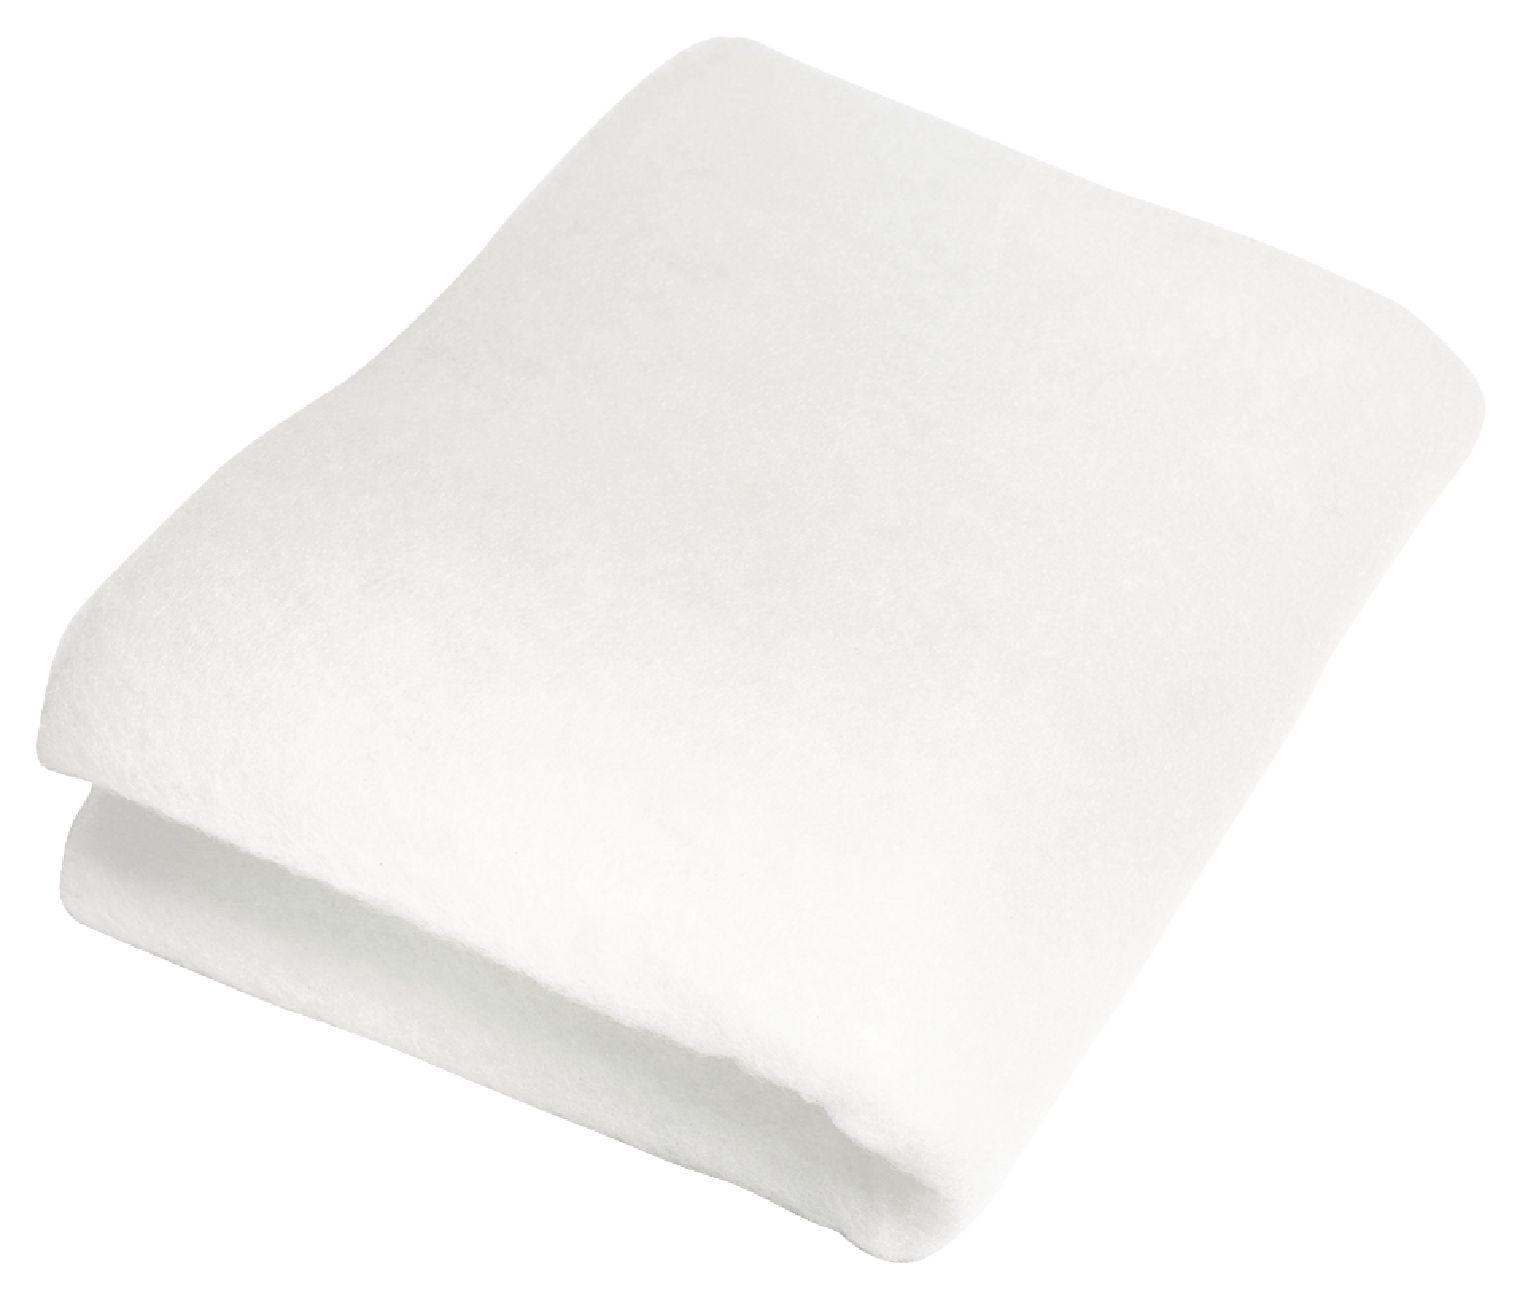 Tukový filtr do digestoře, 100 g/m2, 114 x 47 cm HQ W4-49902/4